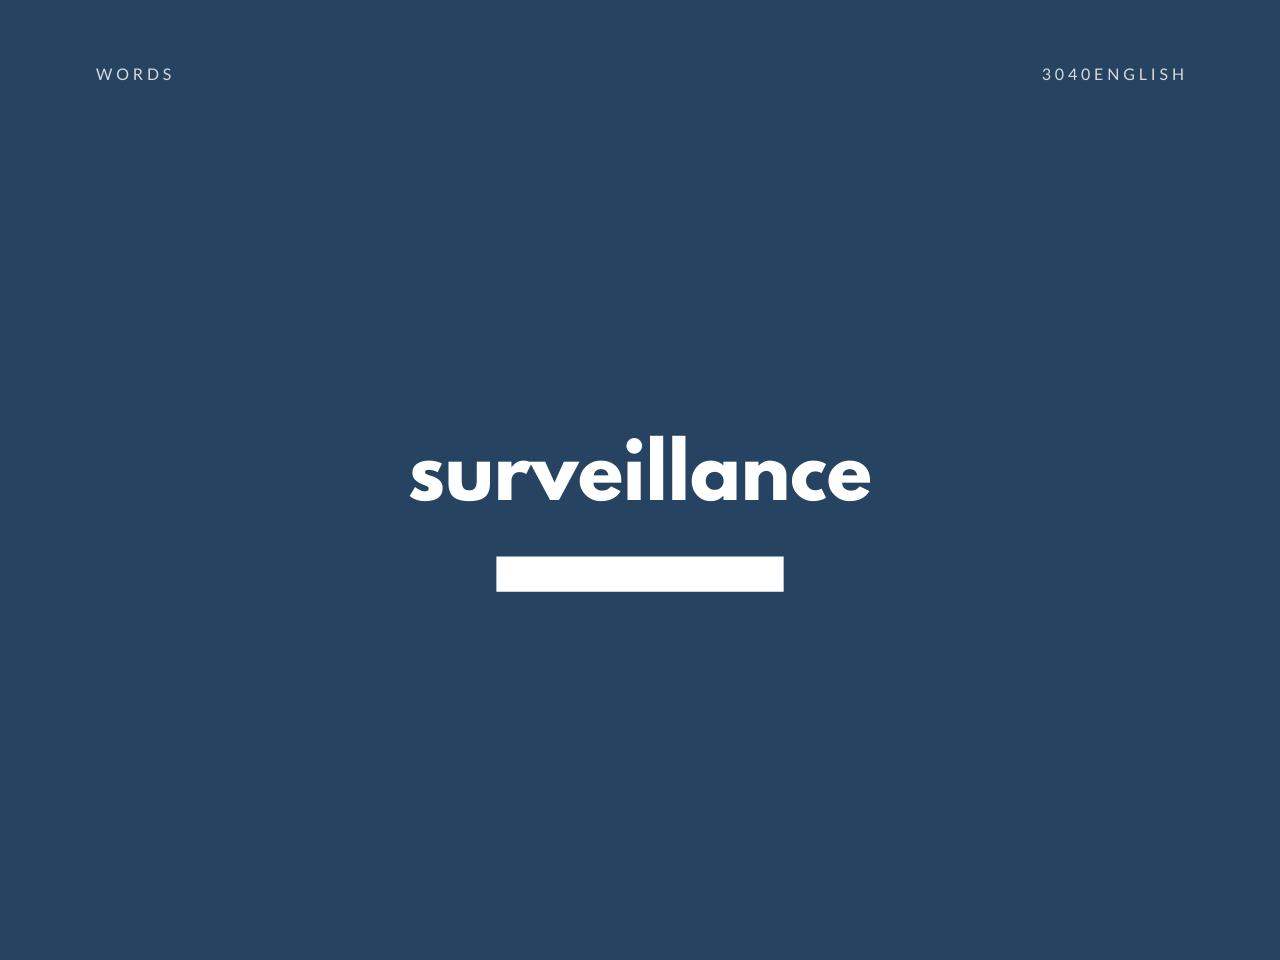 surveillance の意味と簡単な使い方【音読用例文あり】